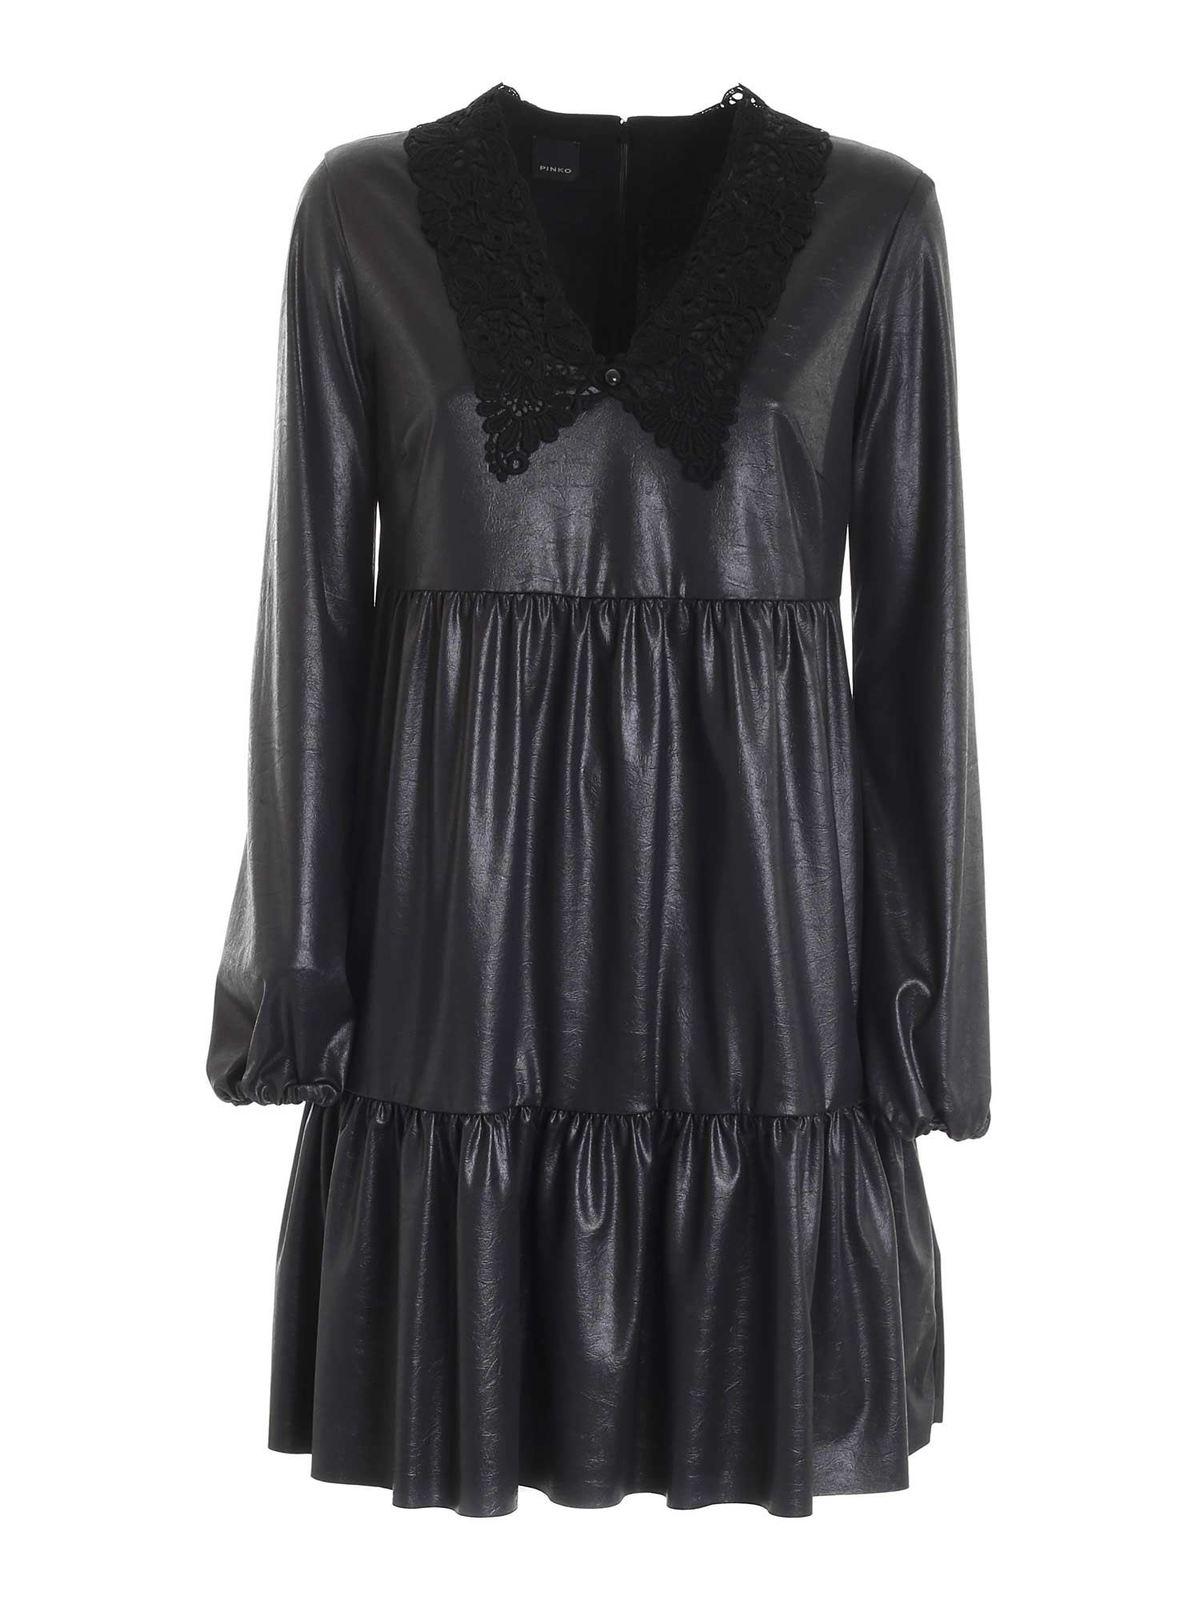 PINKO BABEL DRESS IN BLACK